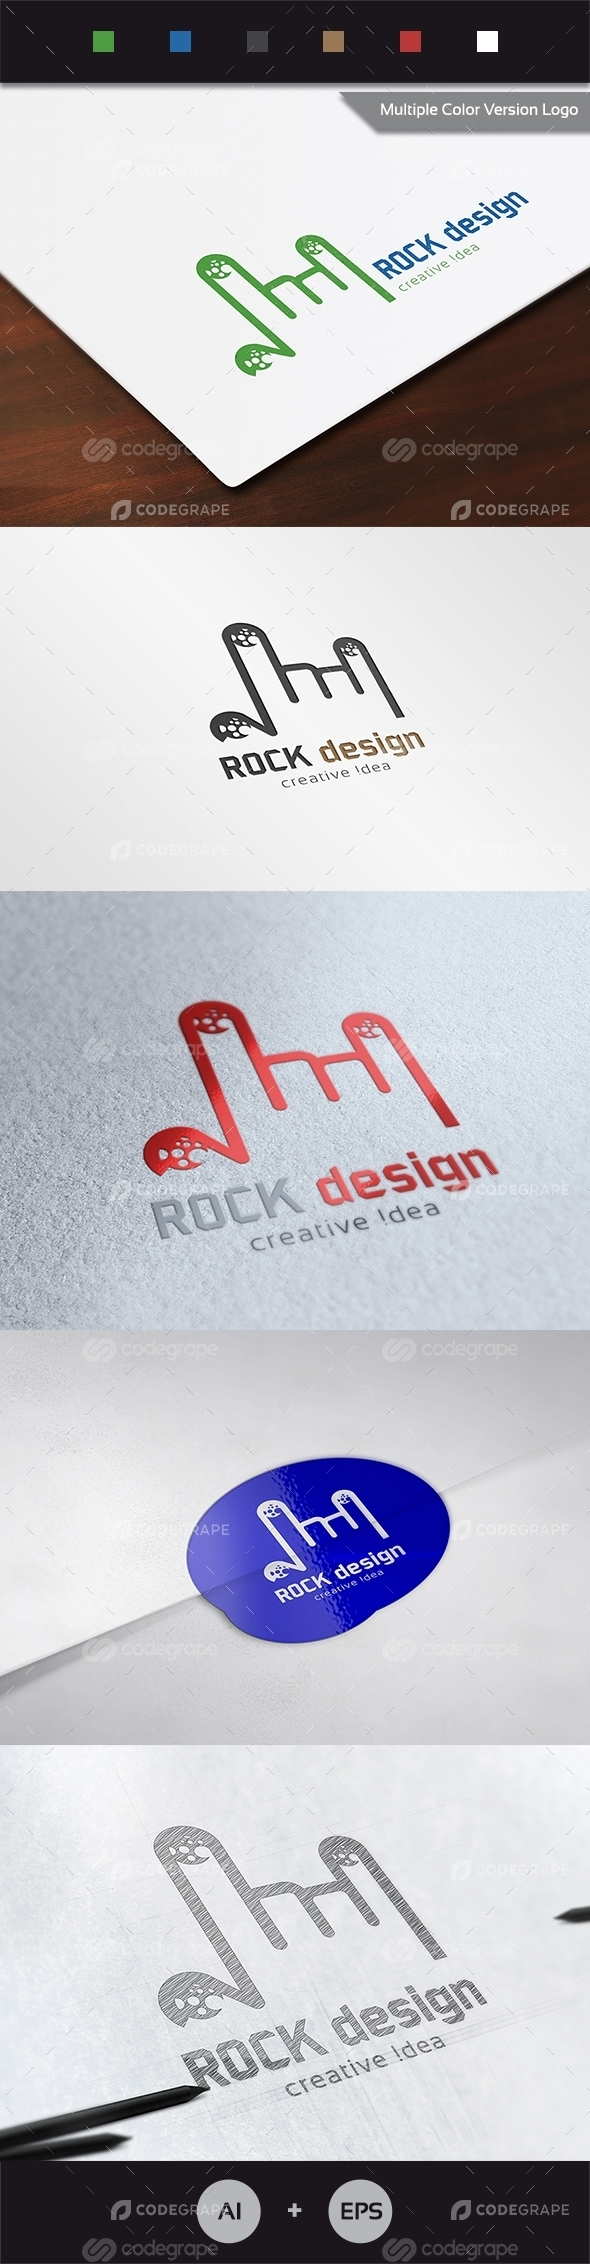 Rock Design Logo